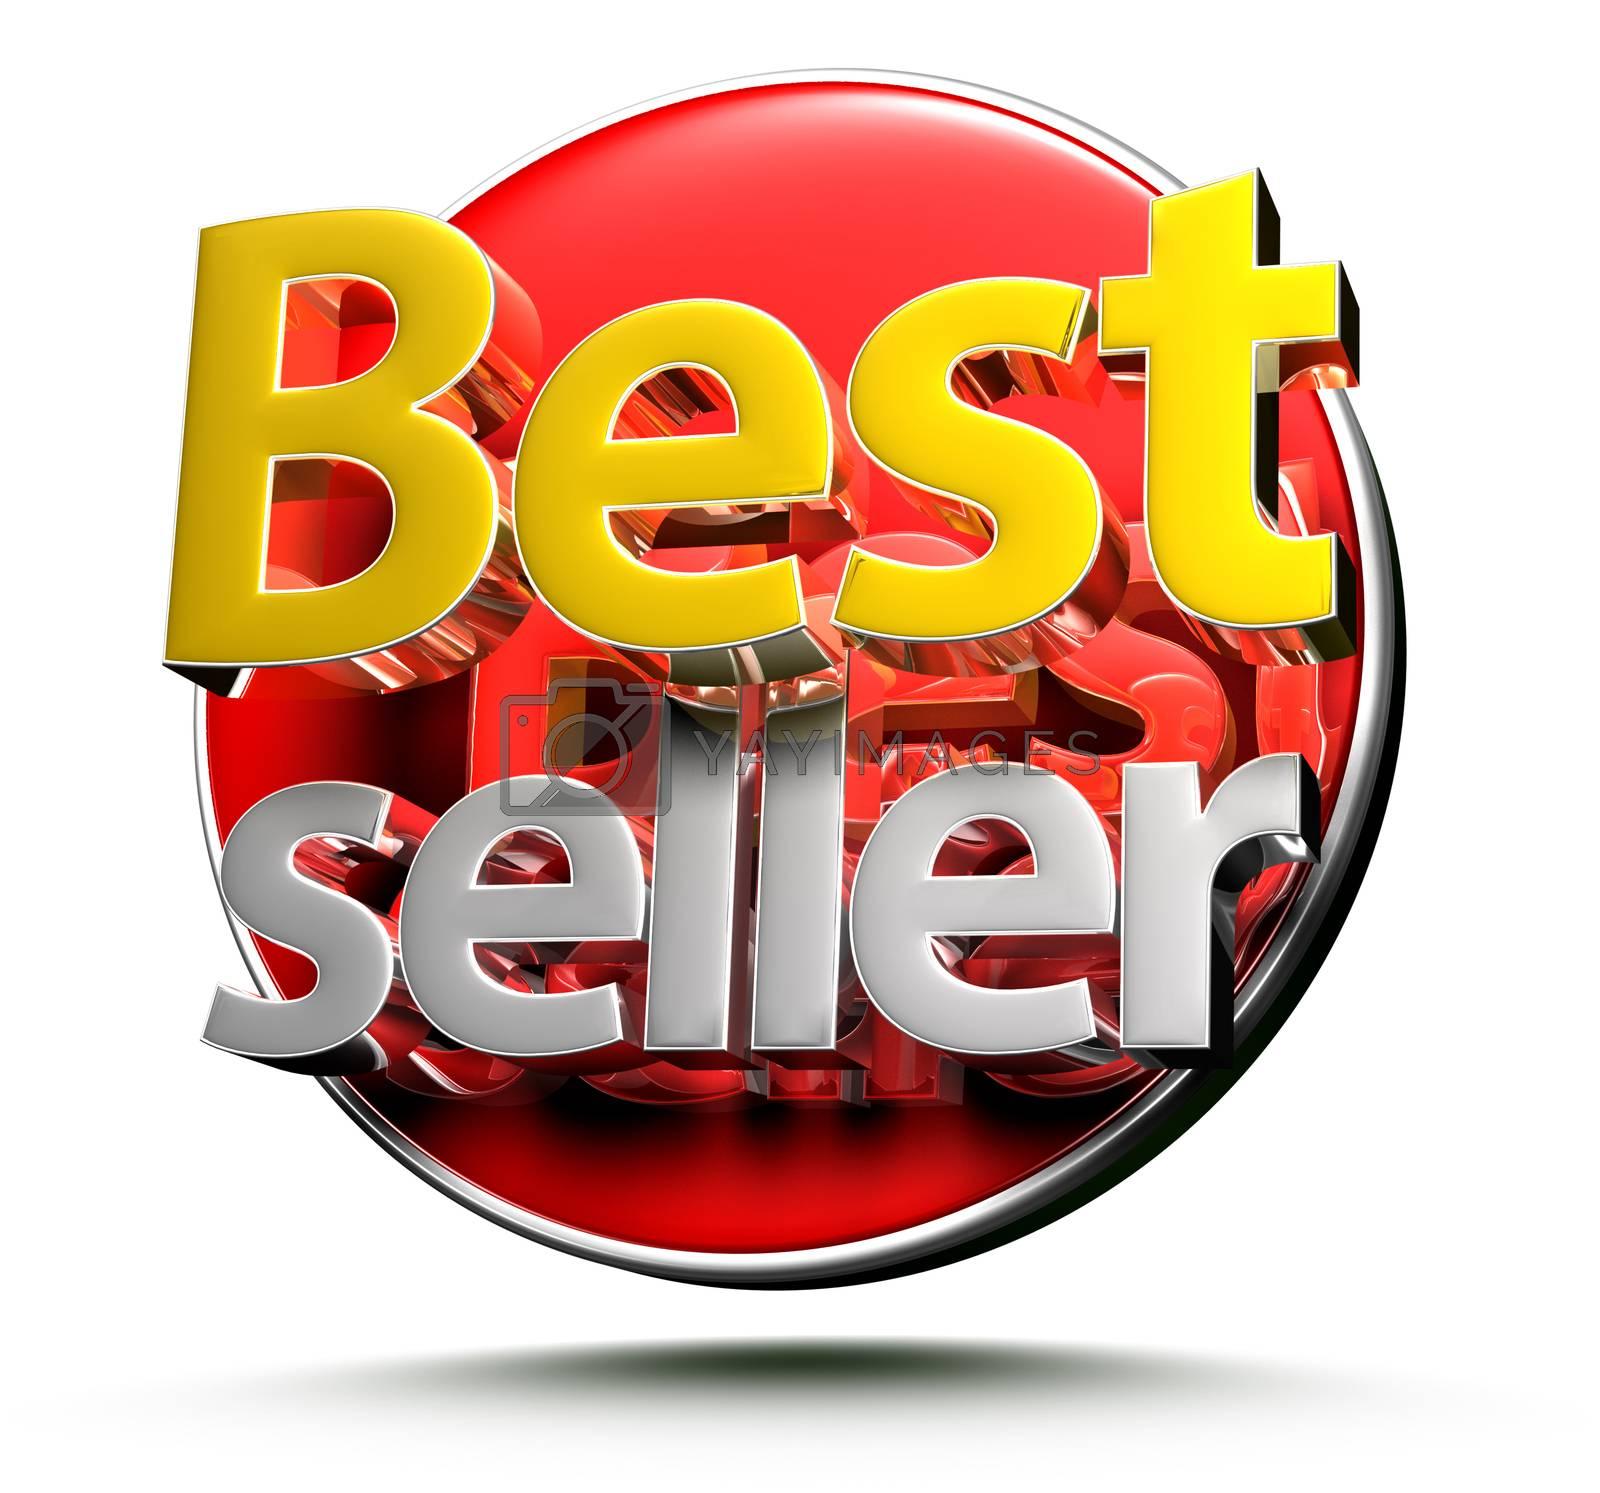 Best seller 3d. by thitimontoyai